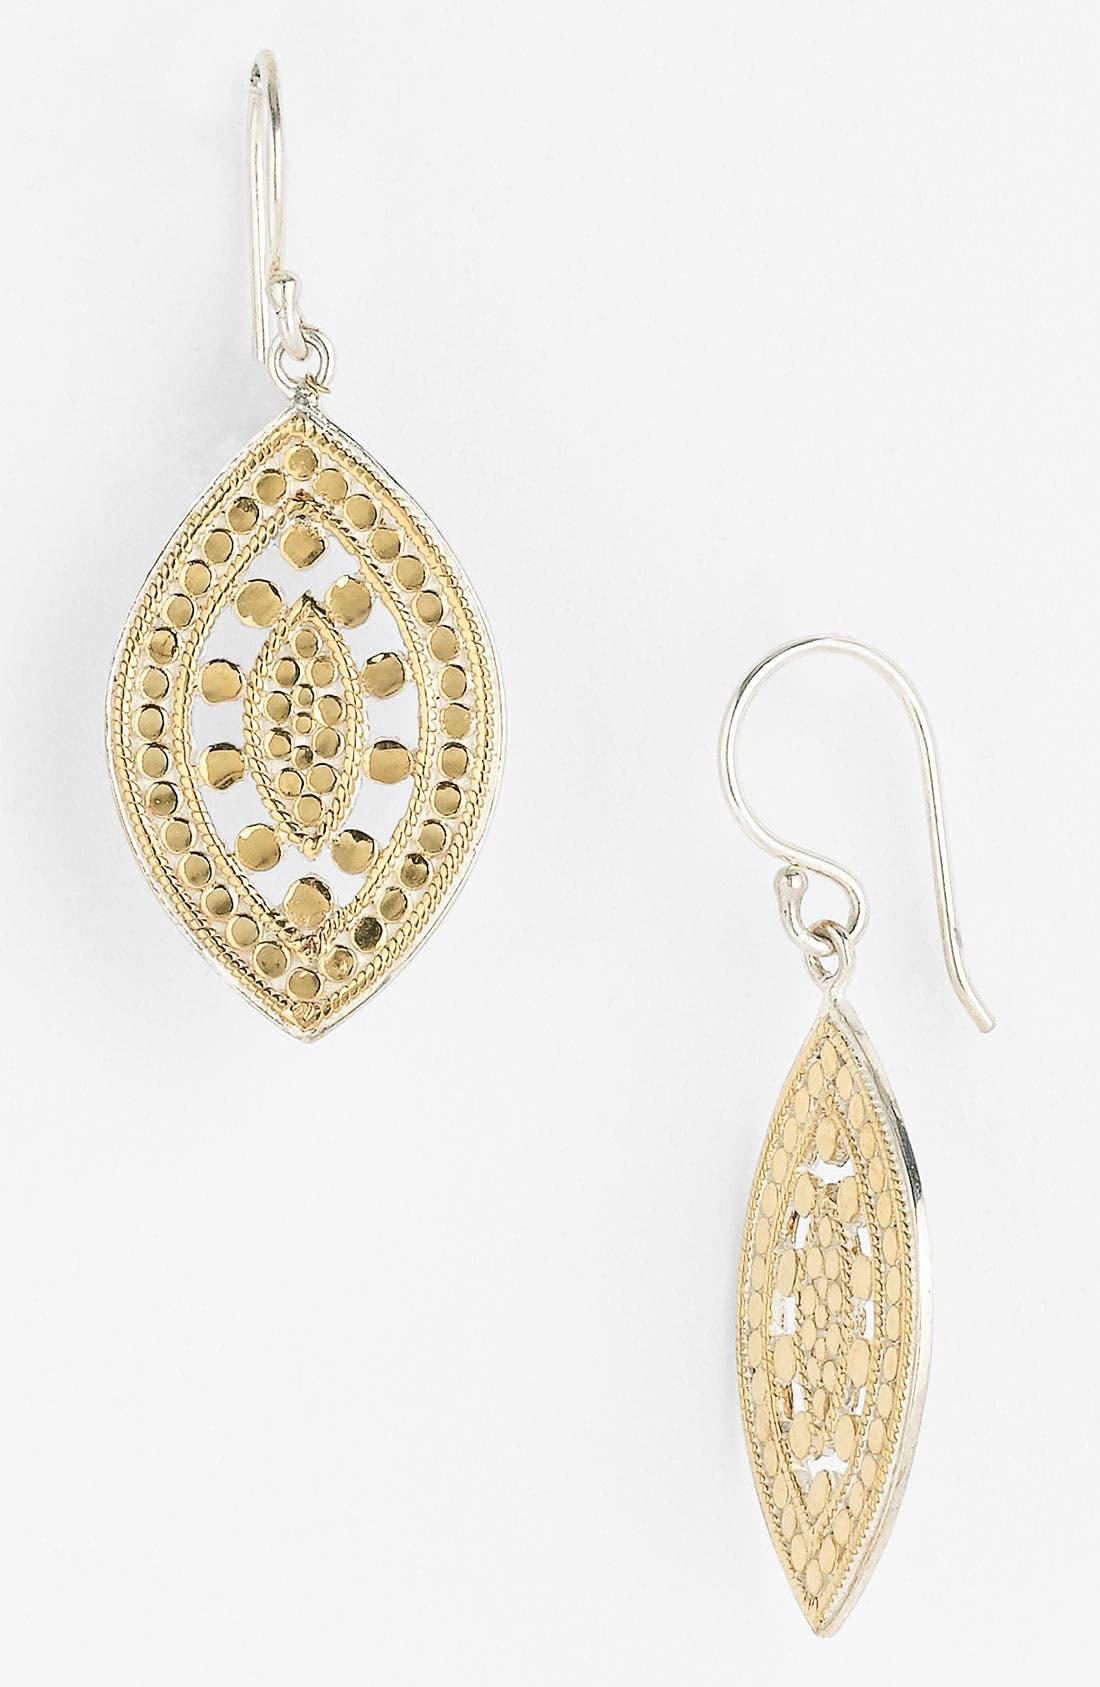 Main Image - Anna Beck 'Lombok' Small Leaf Earrings